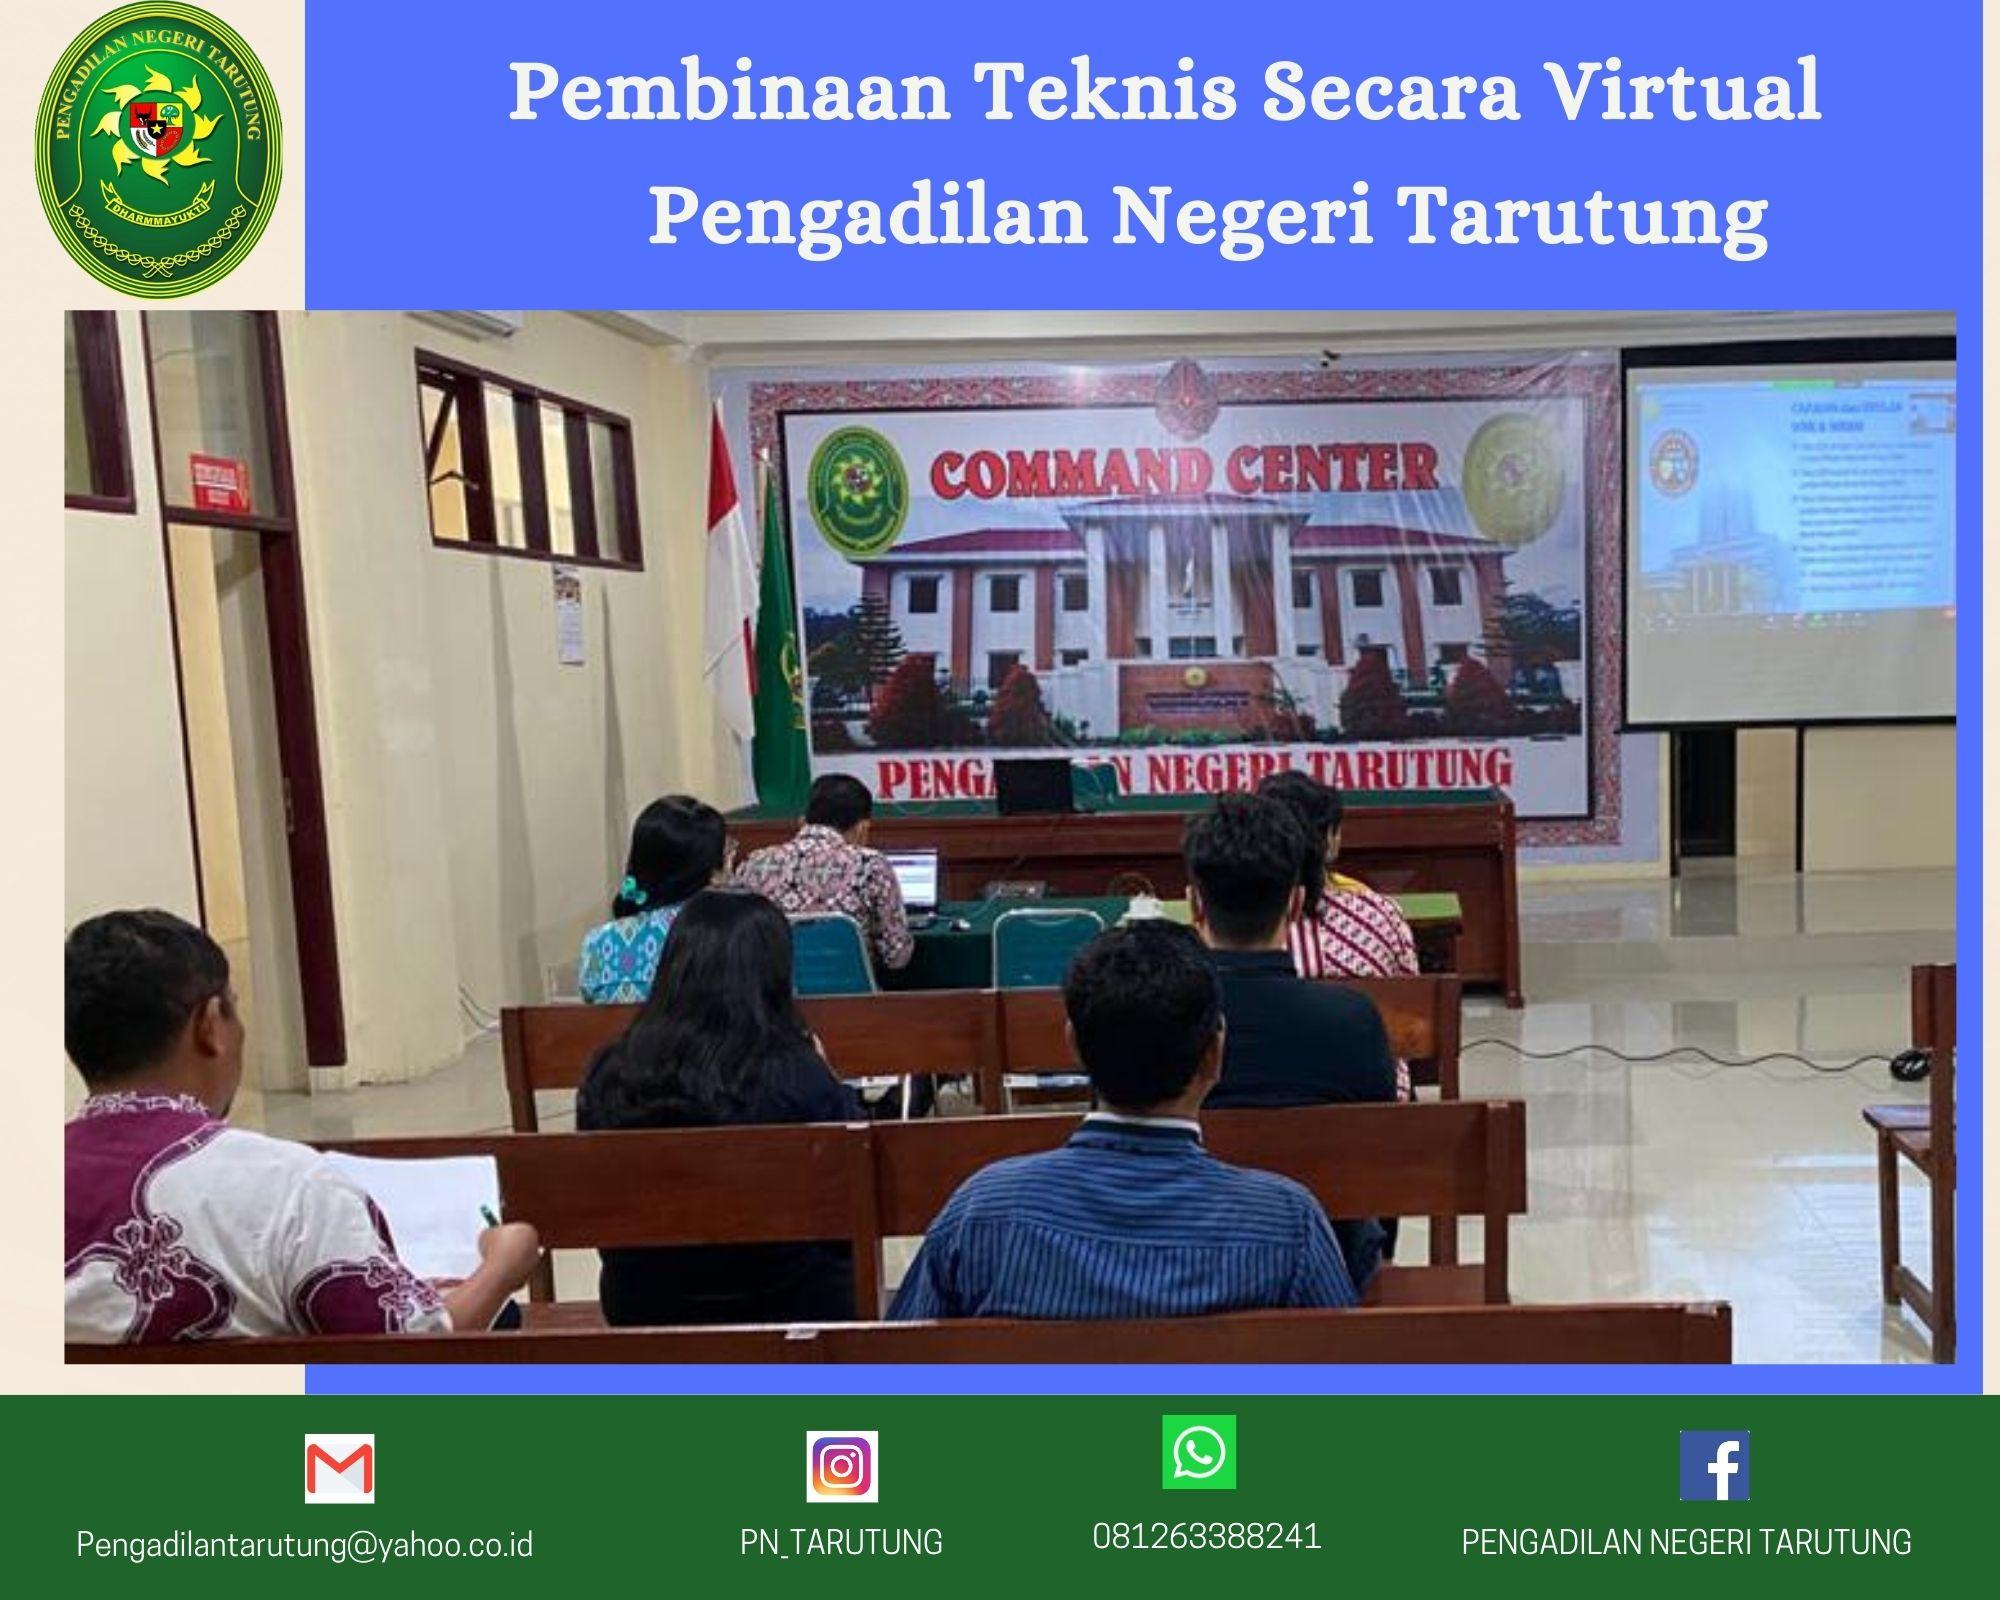 Pembinaan Teknis Secara Virtual Pengadilan Negeri Tarutung